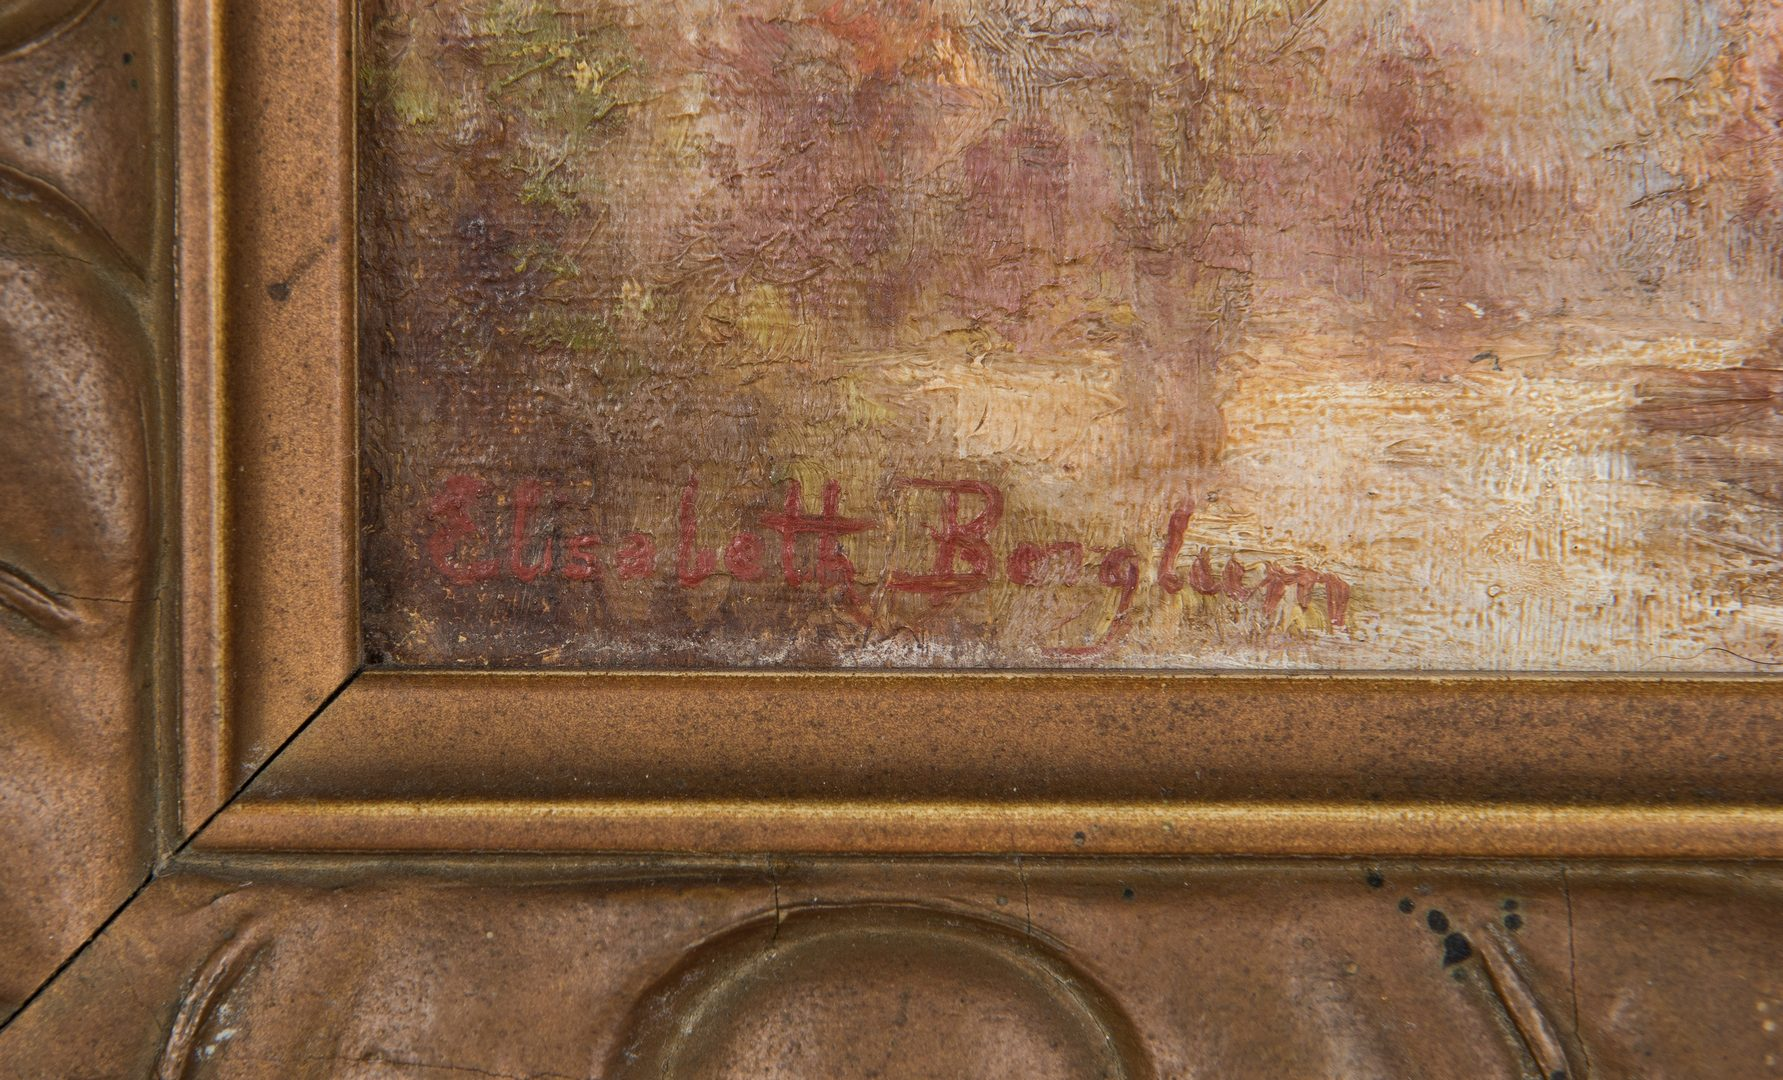 Lot 673: Elizabeth Borglum Small Oil Painting